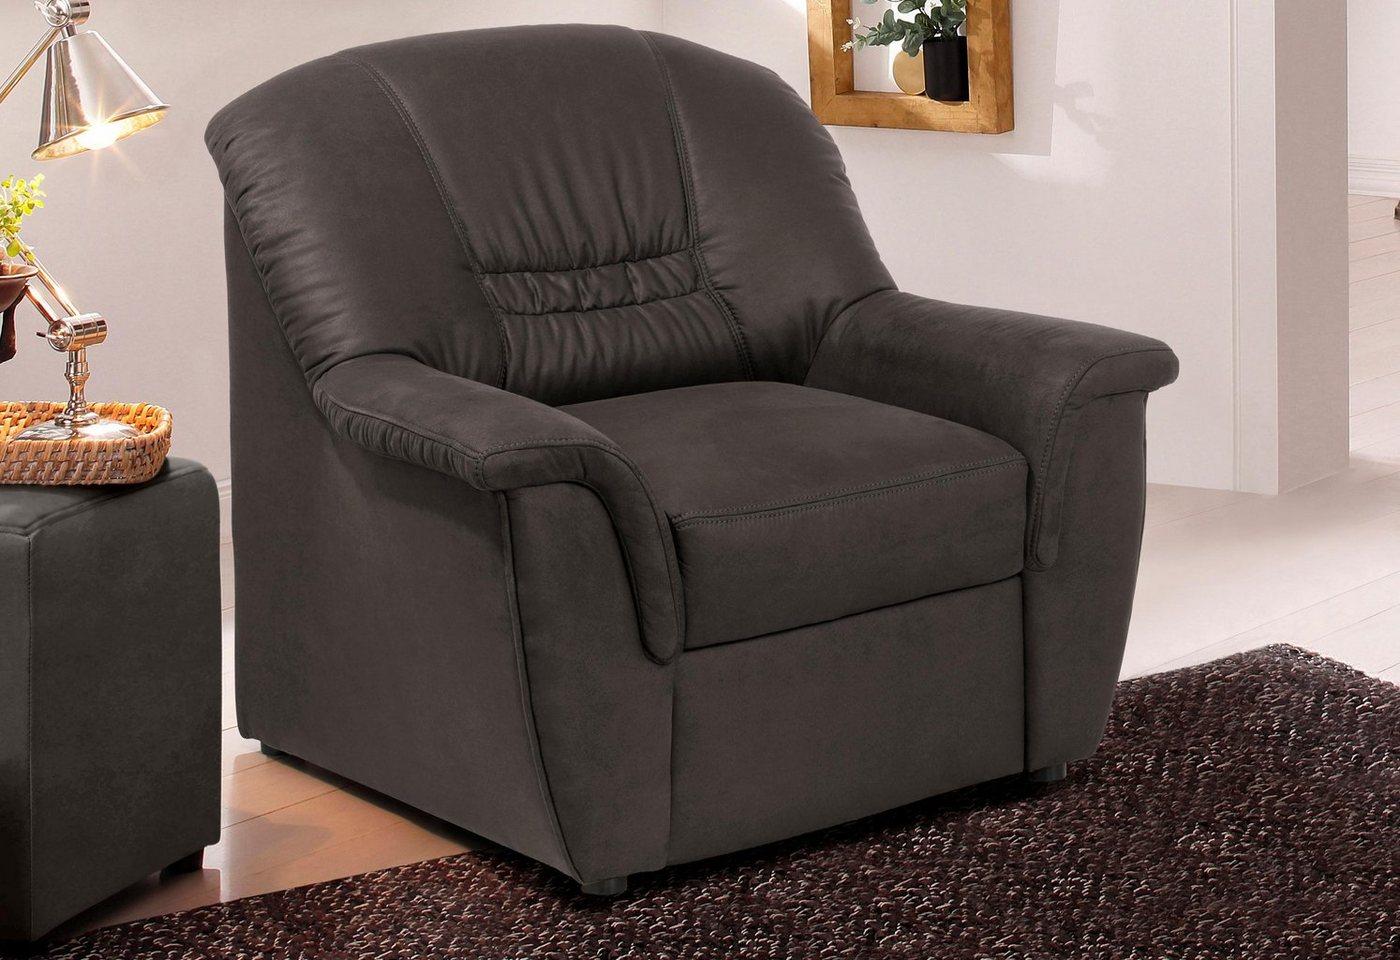 HOME AFFAIRE fauteuil Zoe, met binnenveringsinterieur, in 3 bekledingskwaliteiten